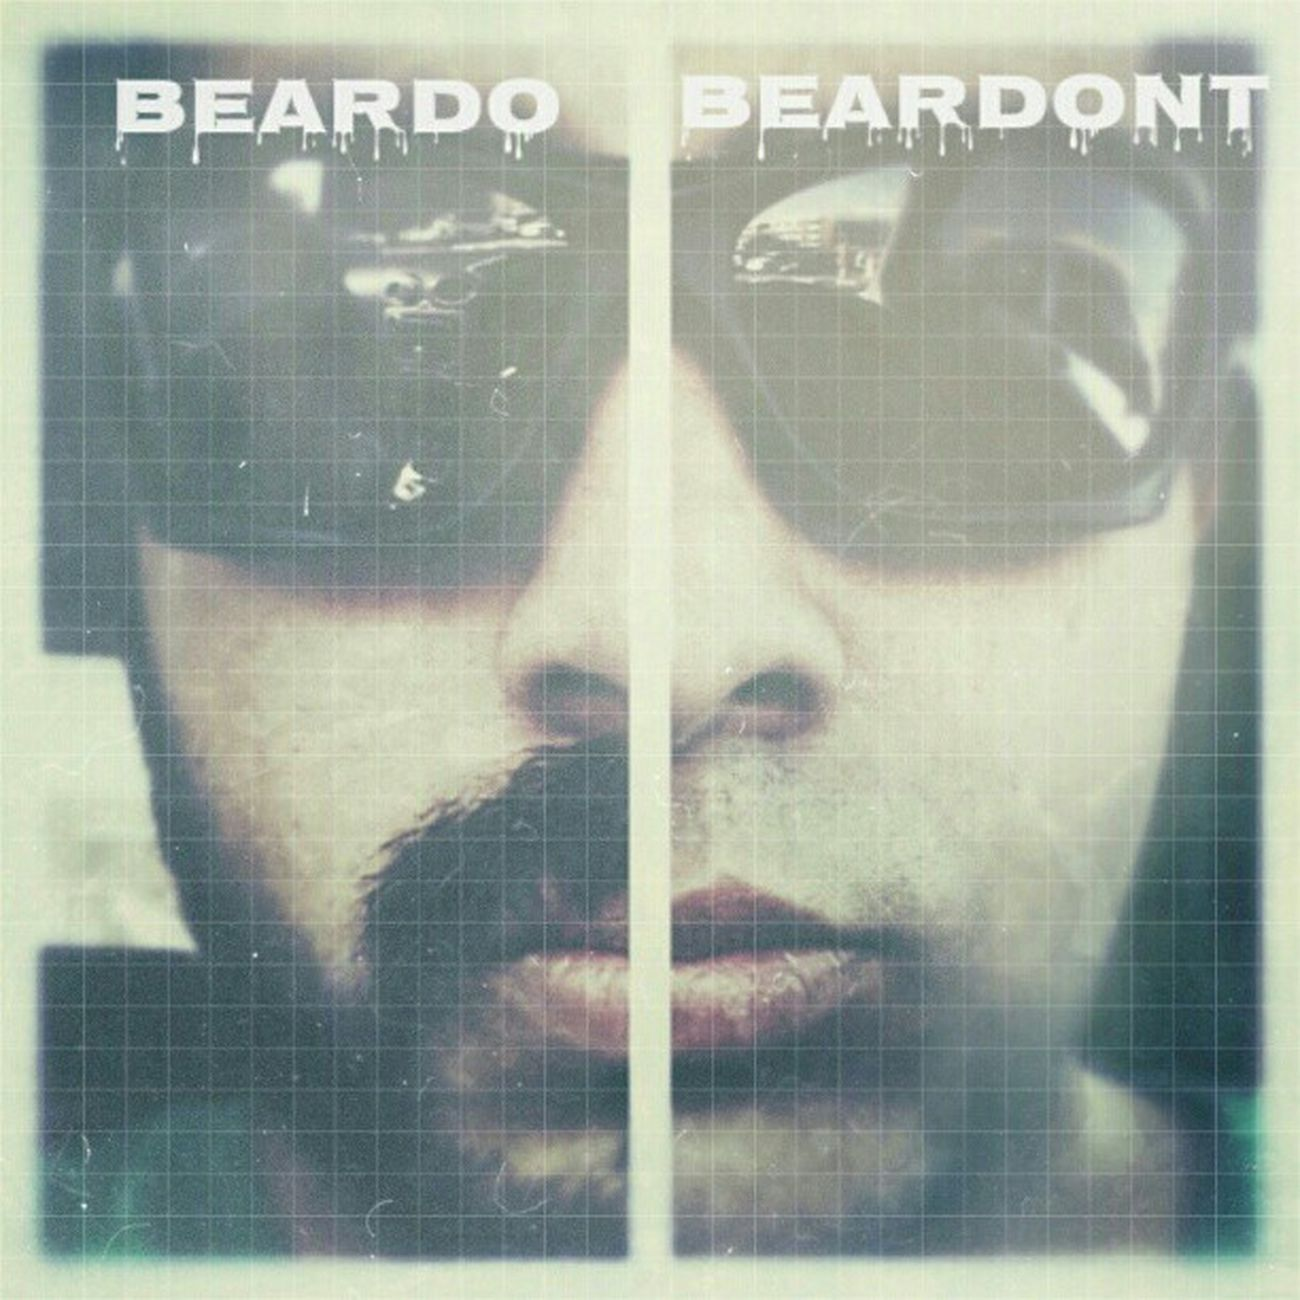 Beard or Beardont??? You choose #snapseed #impashape #droidedit #lilphoto #droidedit #mextures #ampt_community #lumiform #selfpotrait #ndpattern Selfpotrait Snapseed DroidEdit AMPt_community Mextures Lumiform Ndpattern Impashape Lilphoto